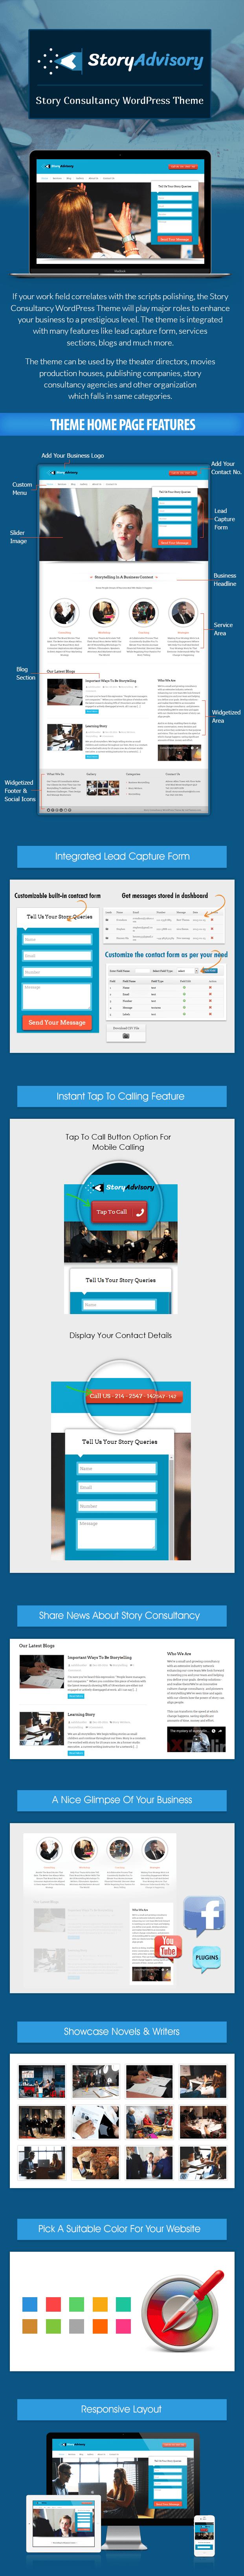 Story Consultancy WordPress Theme sales